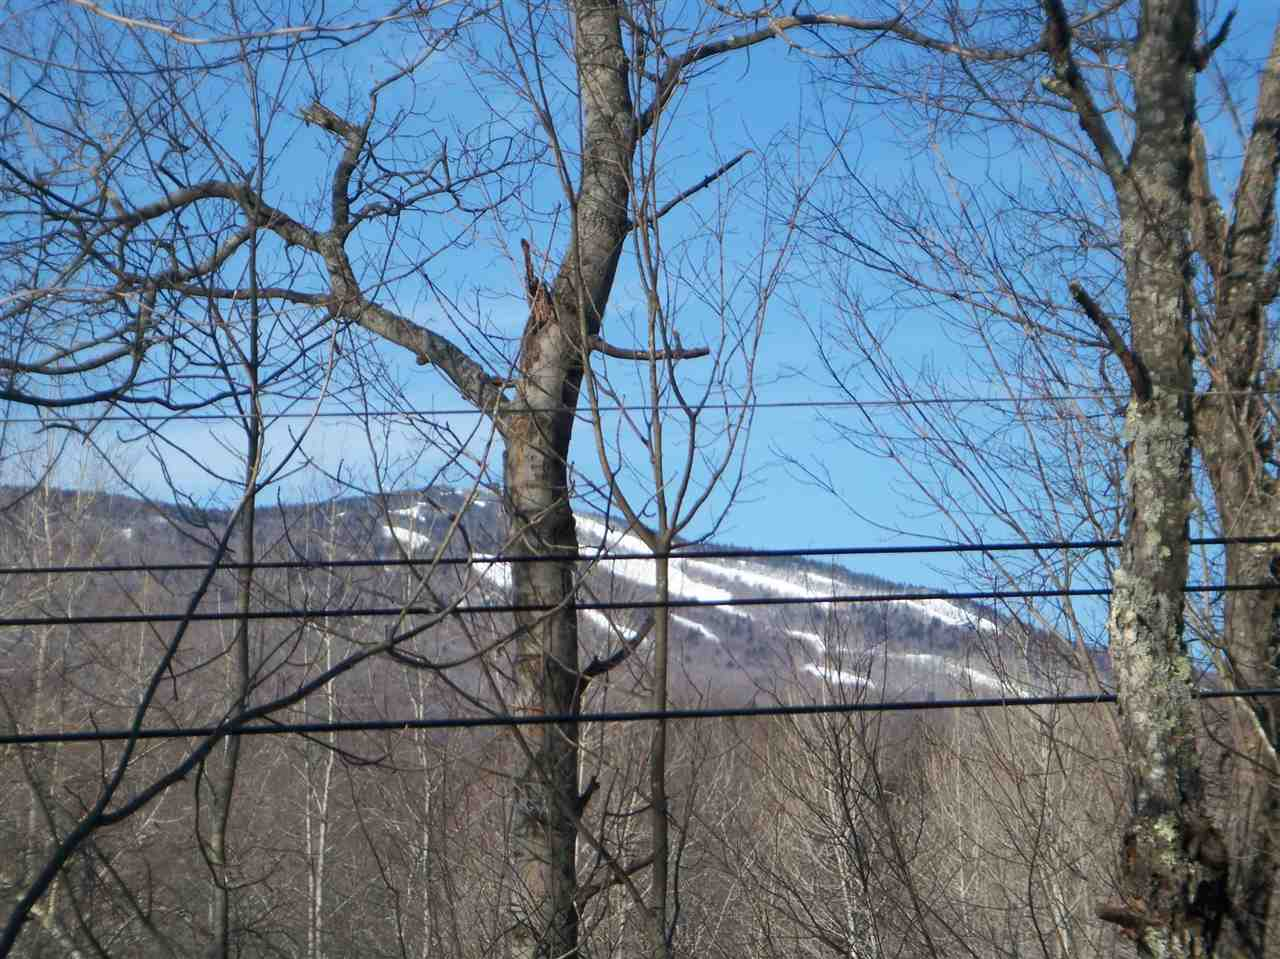 Mount-Snow-Real-Estate-4623747-1